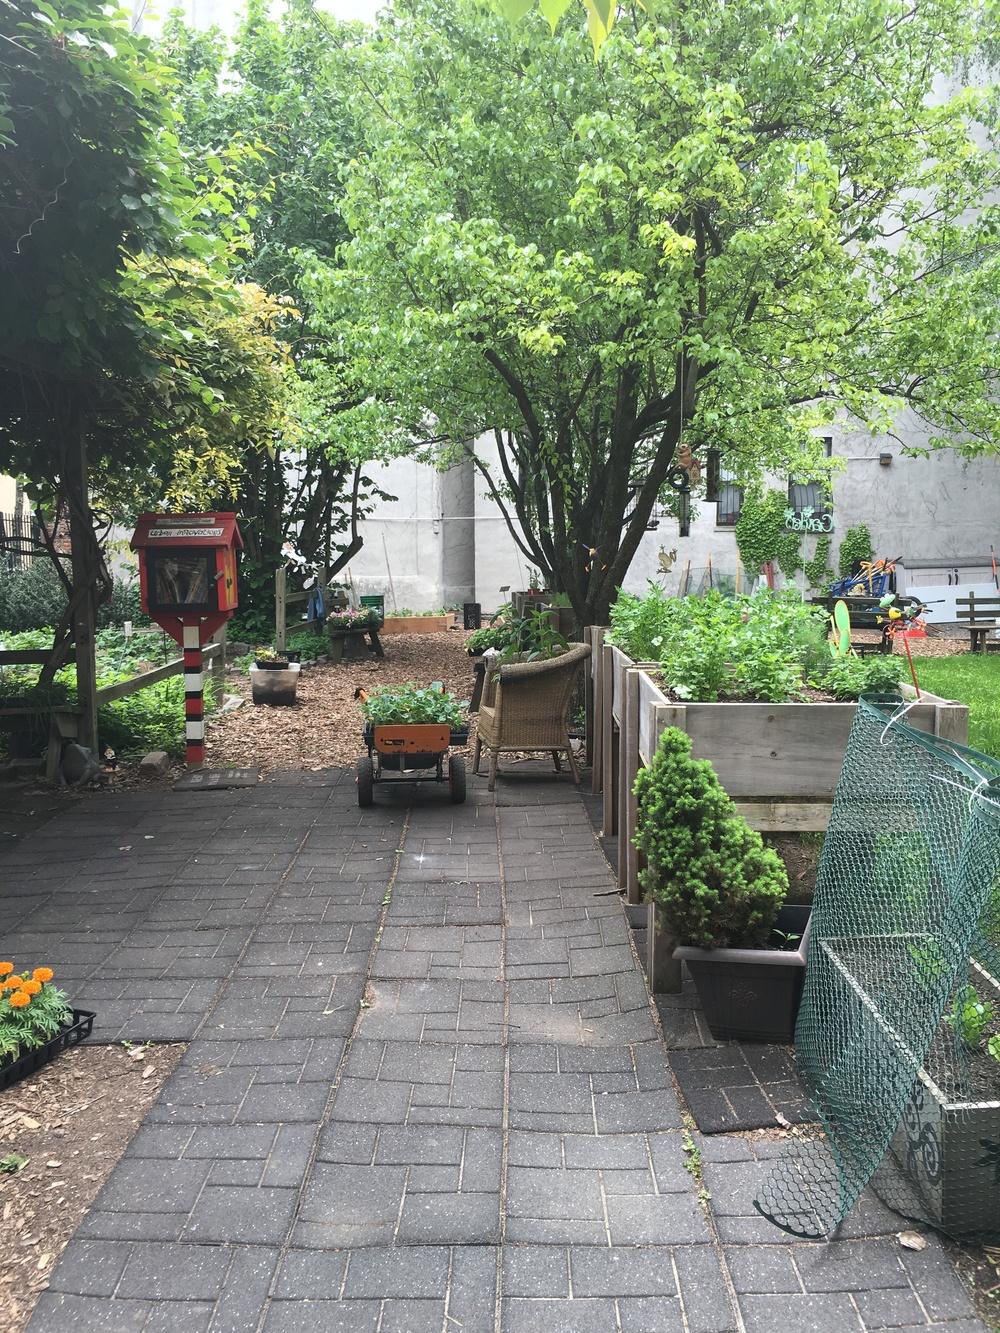 Harlem Grown's 134th Street Garden